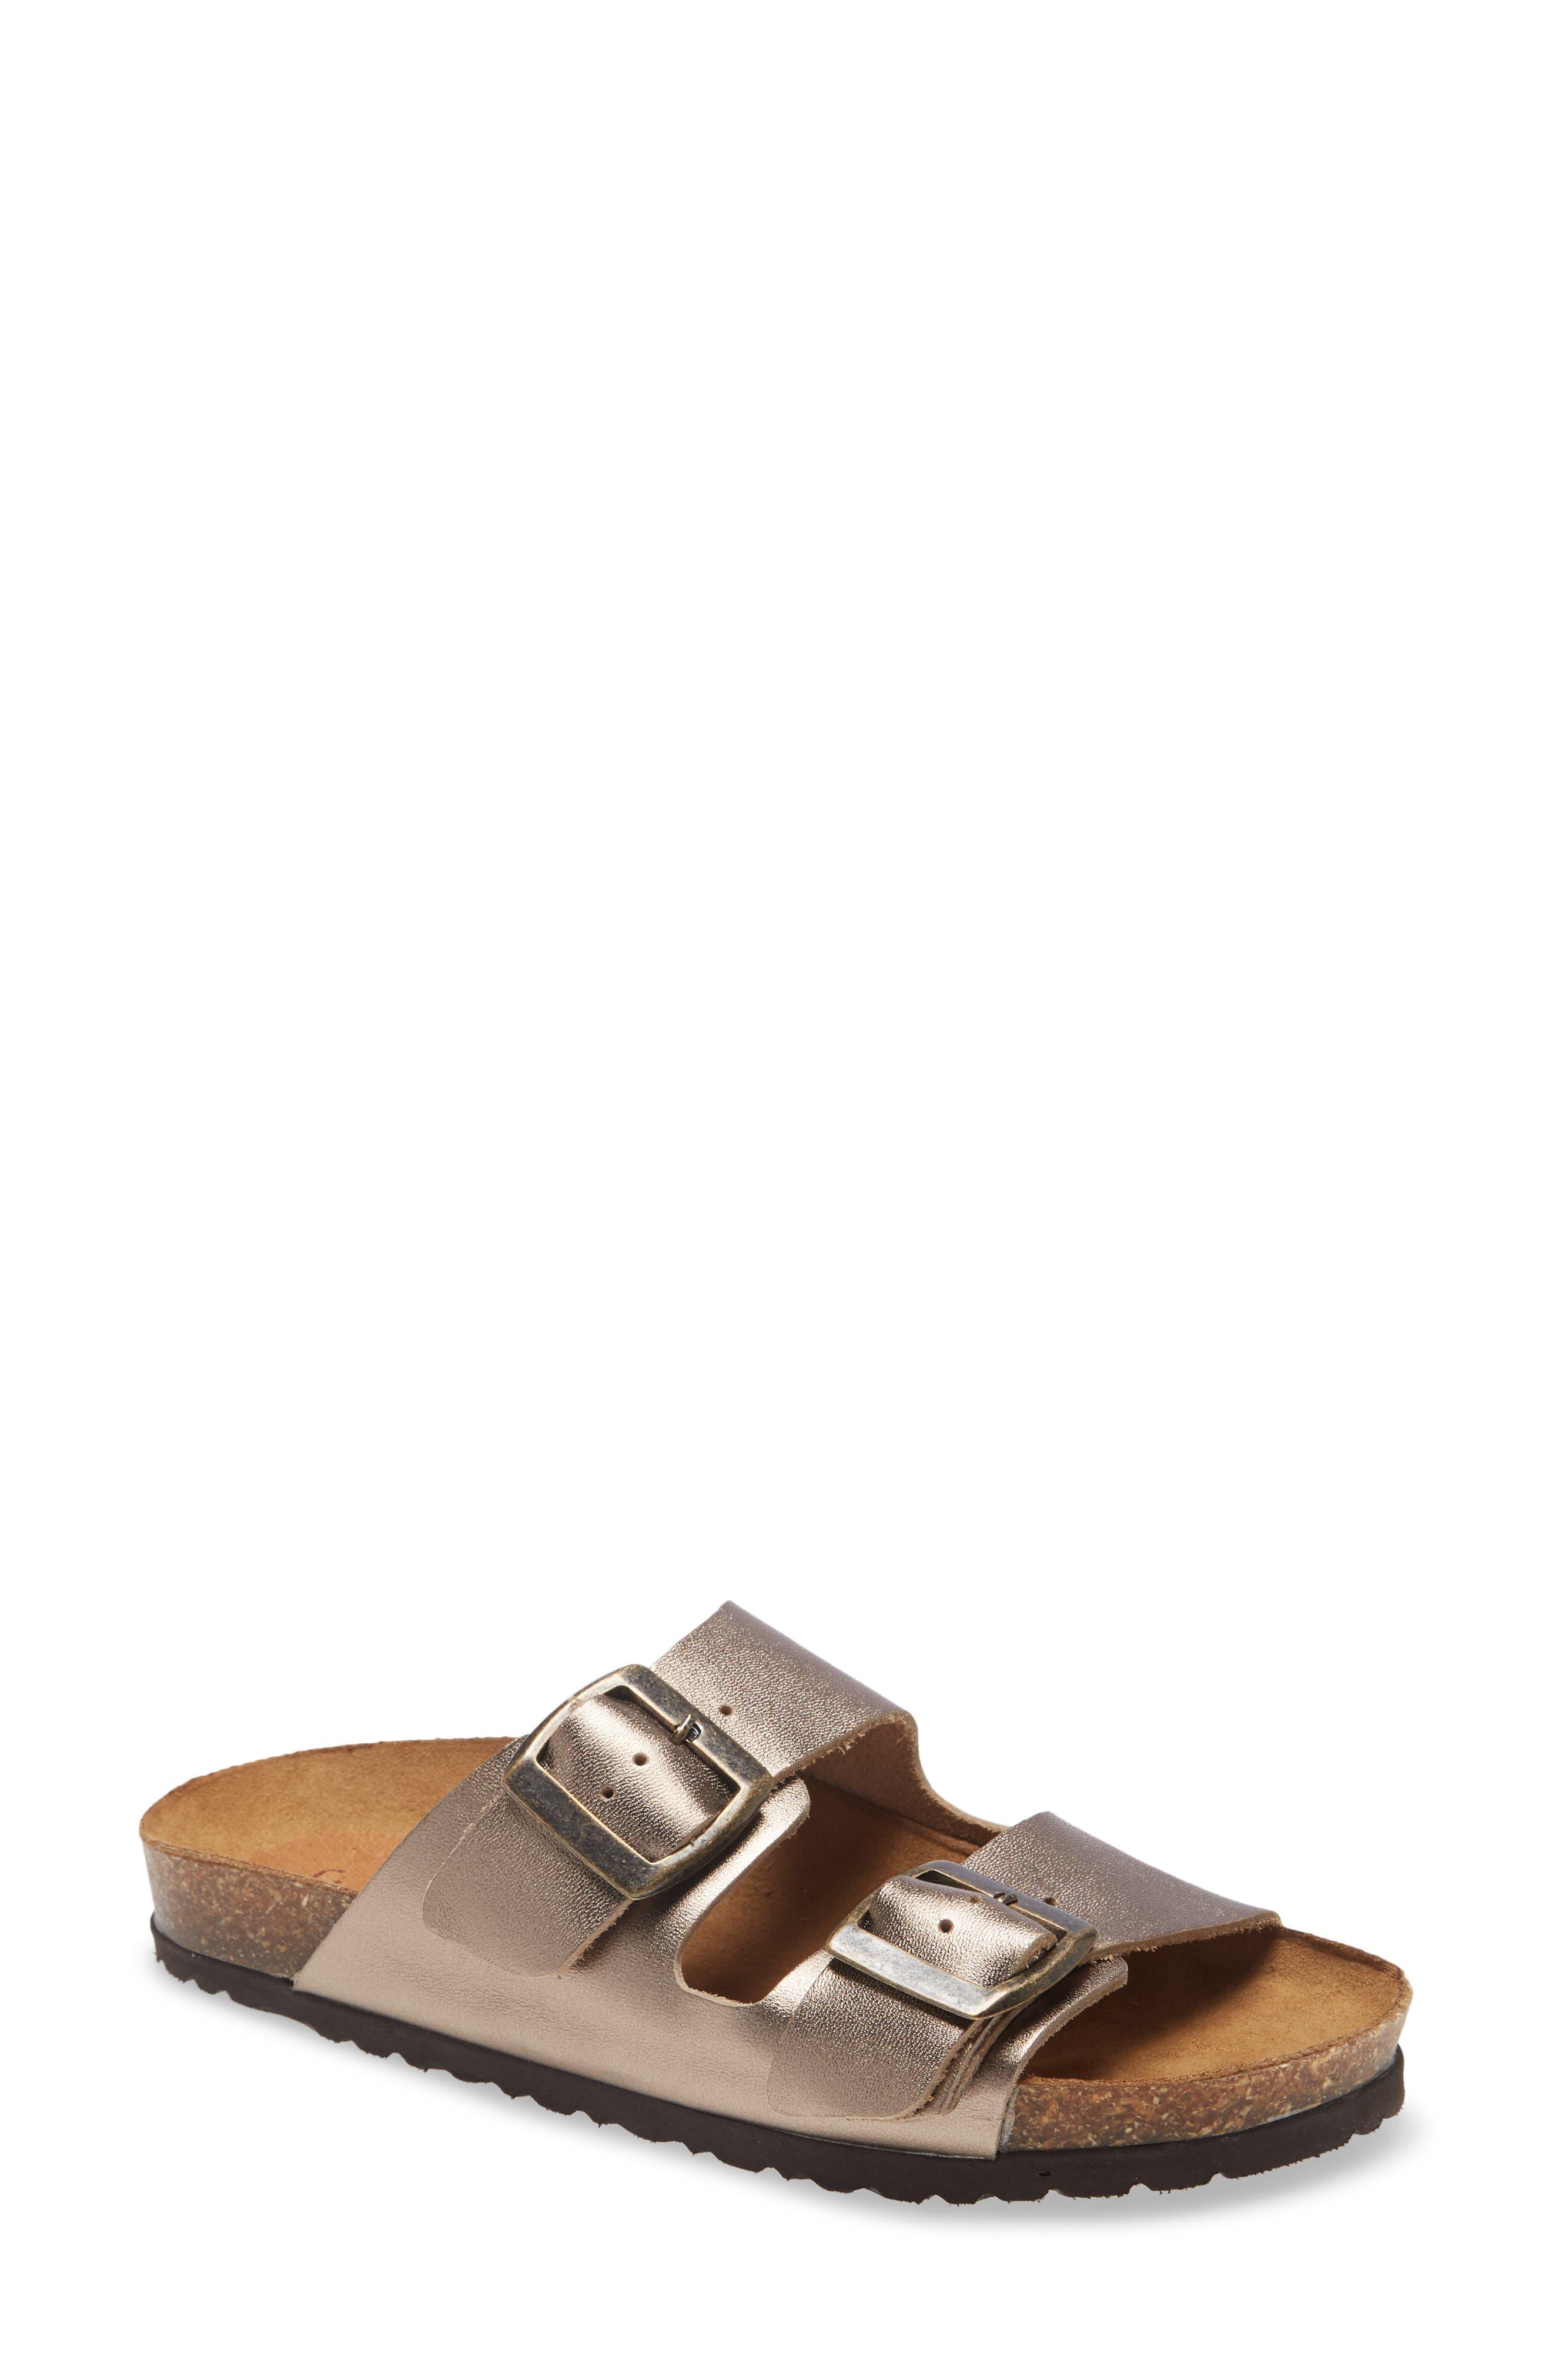 Milo Slide Sandal